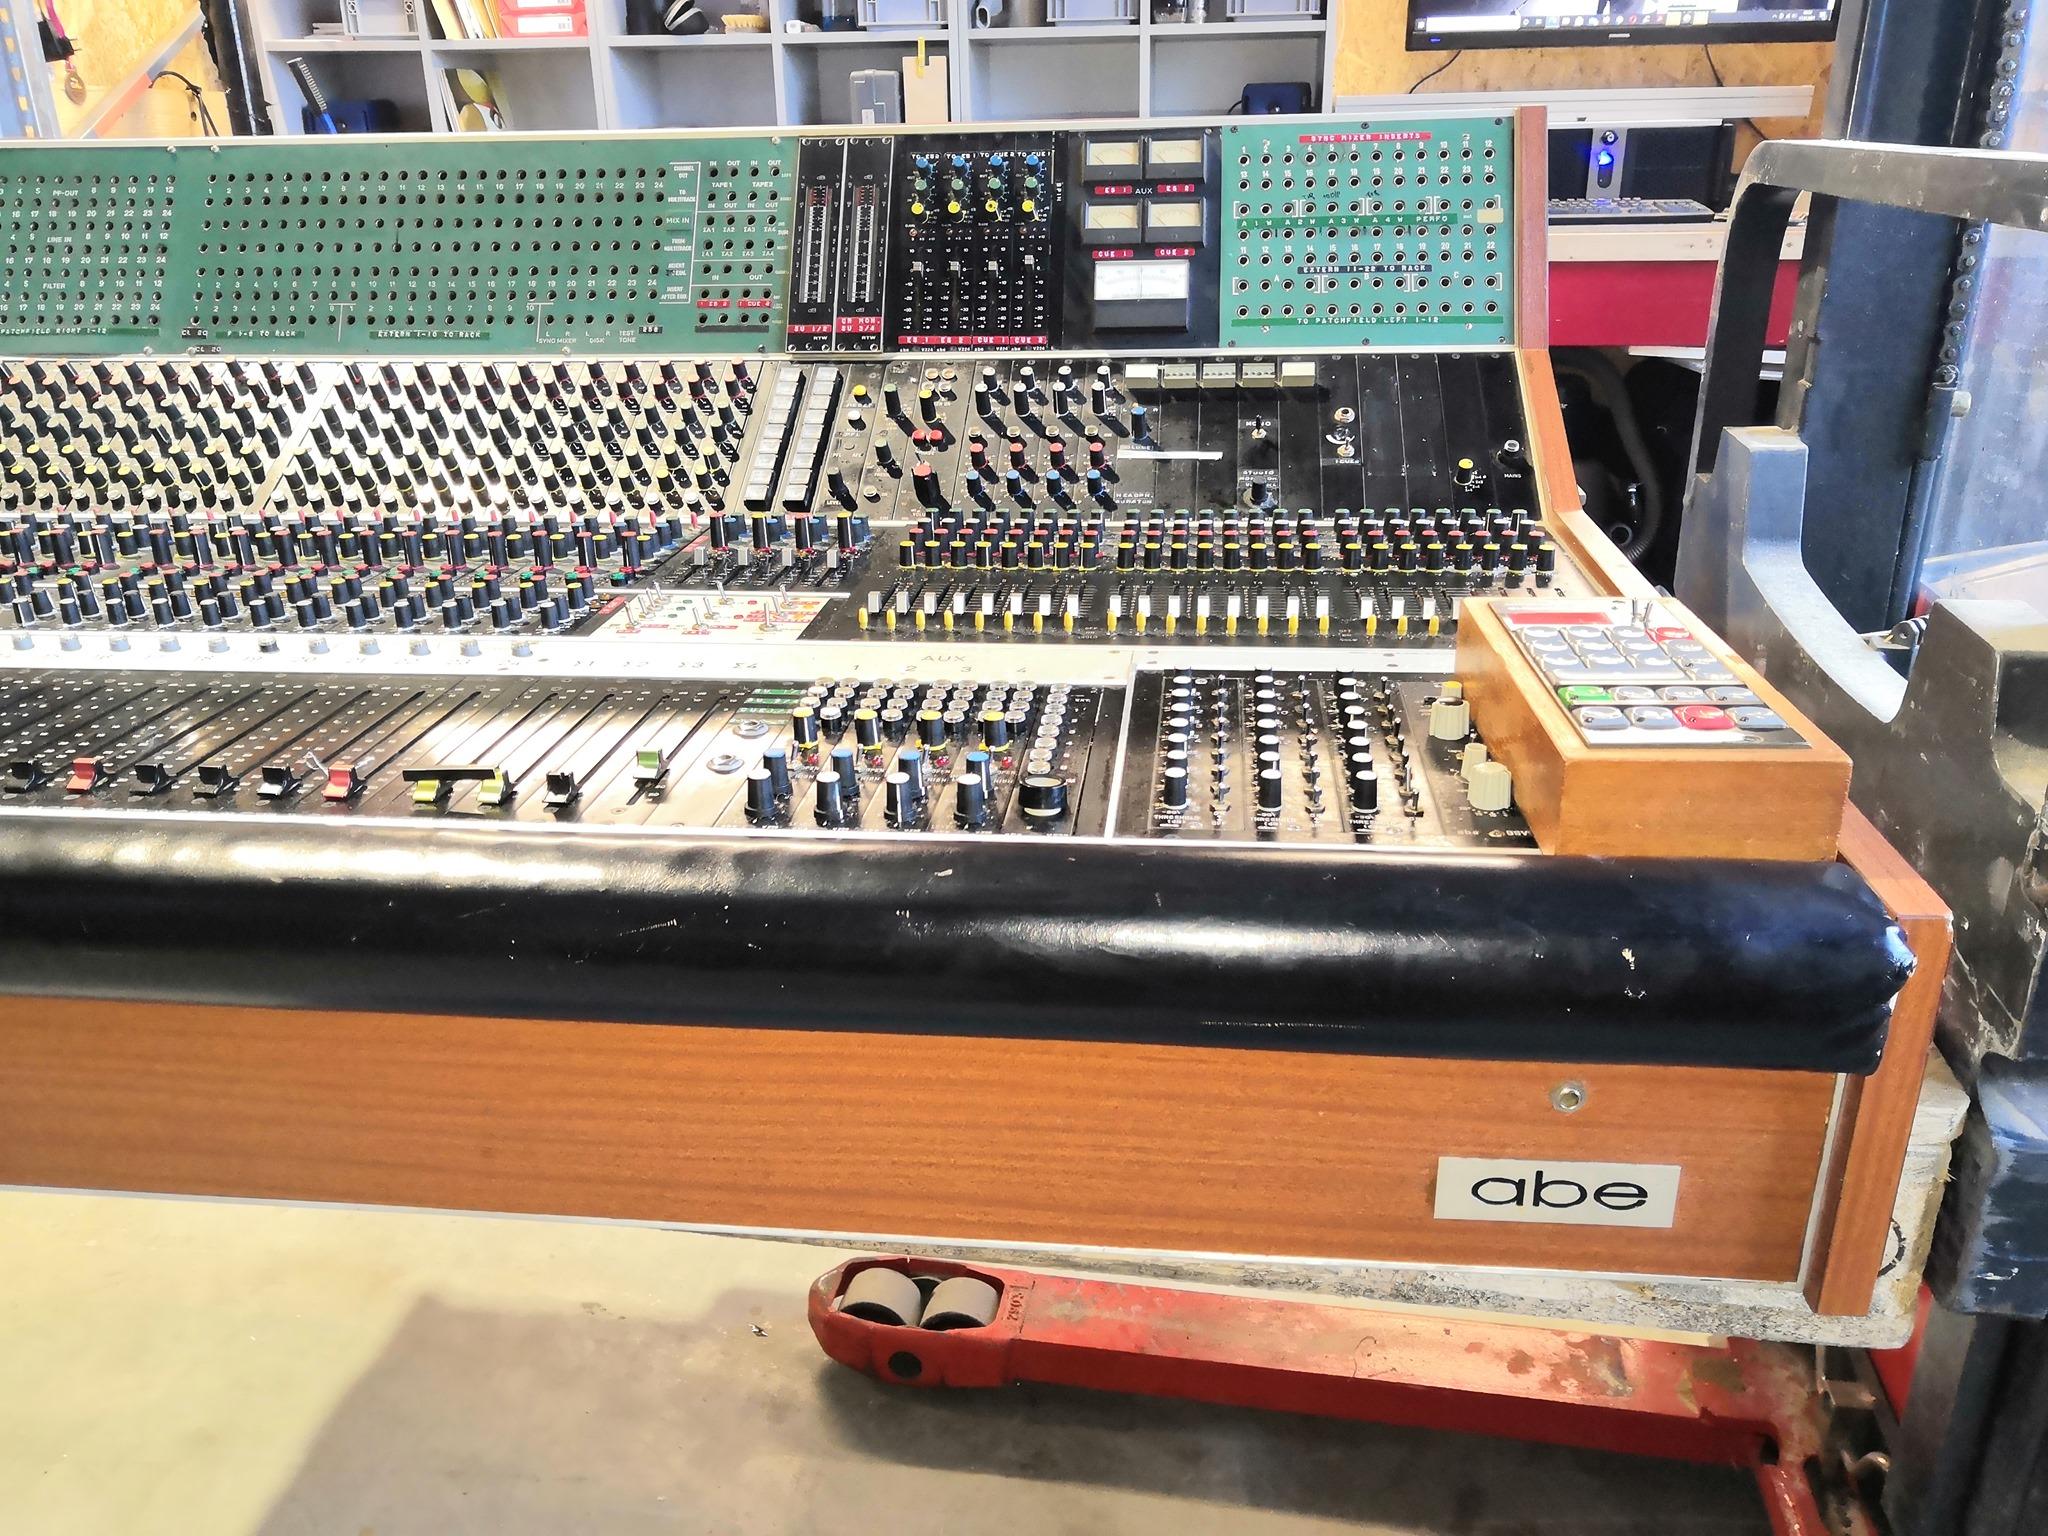 603aa9e193ed6_backlinerent.de_telefuken-abe-original-recording-desk-das-boot-klaus-doldinger